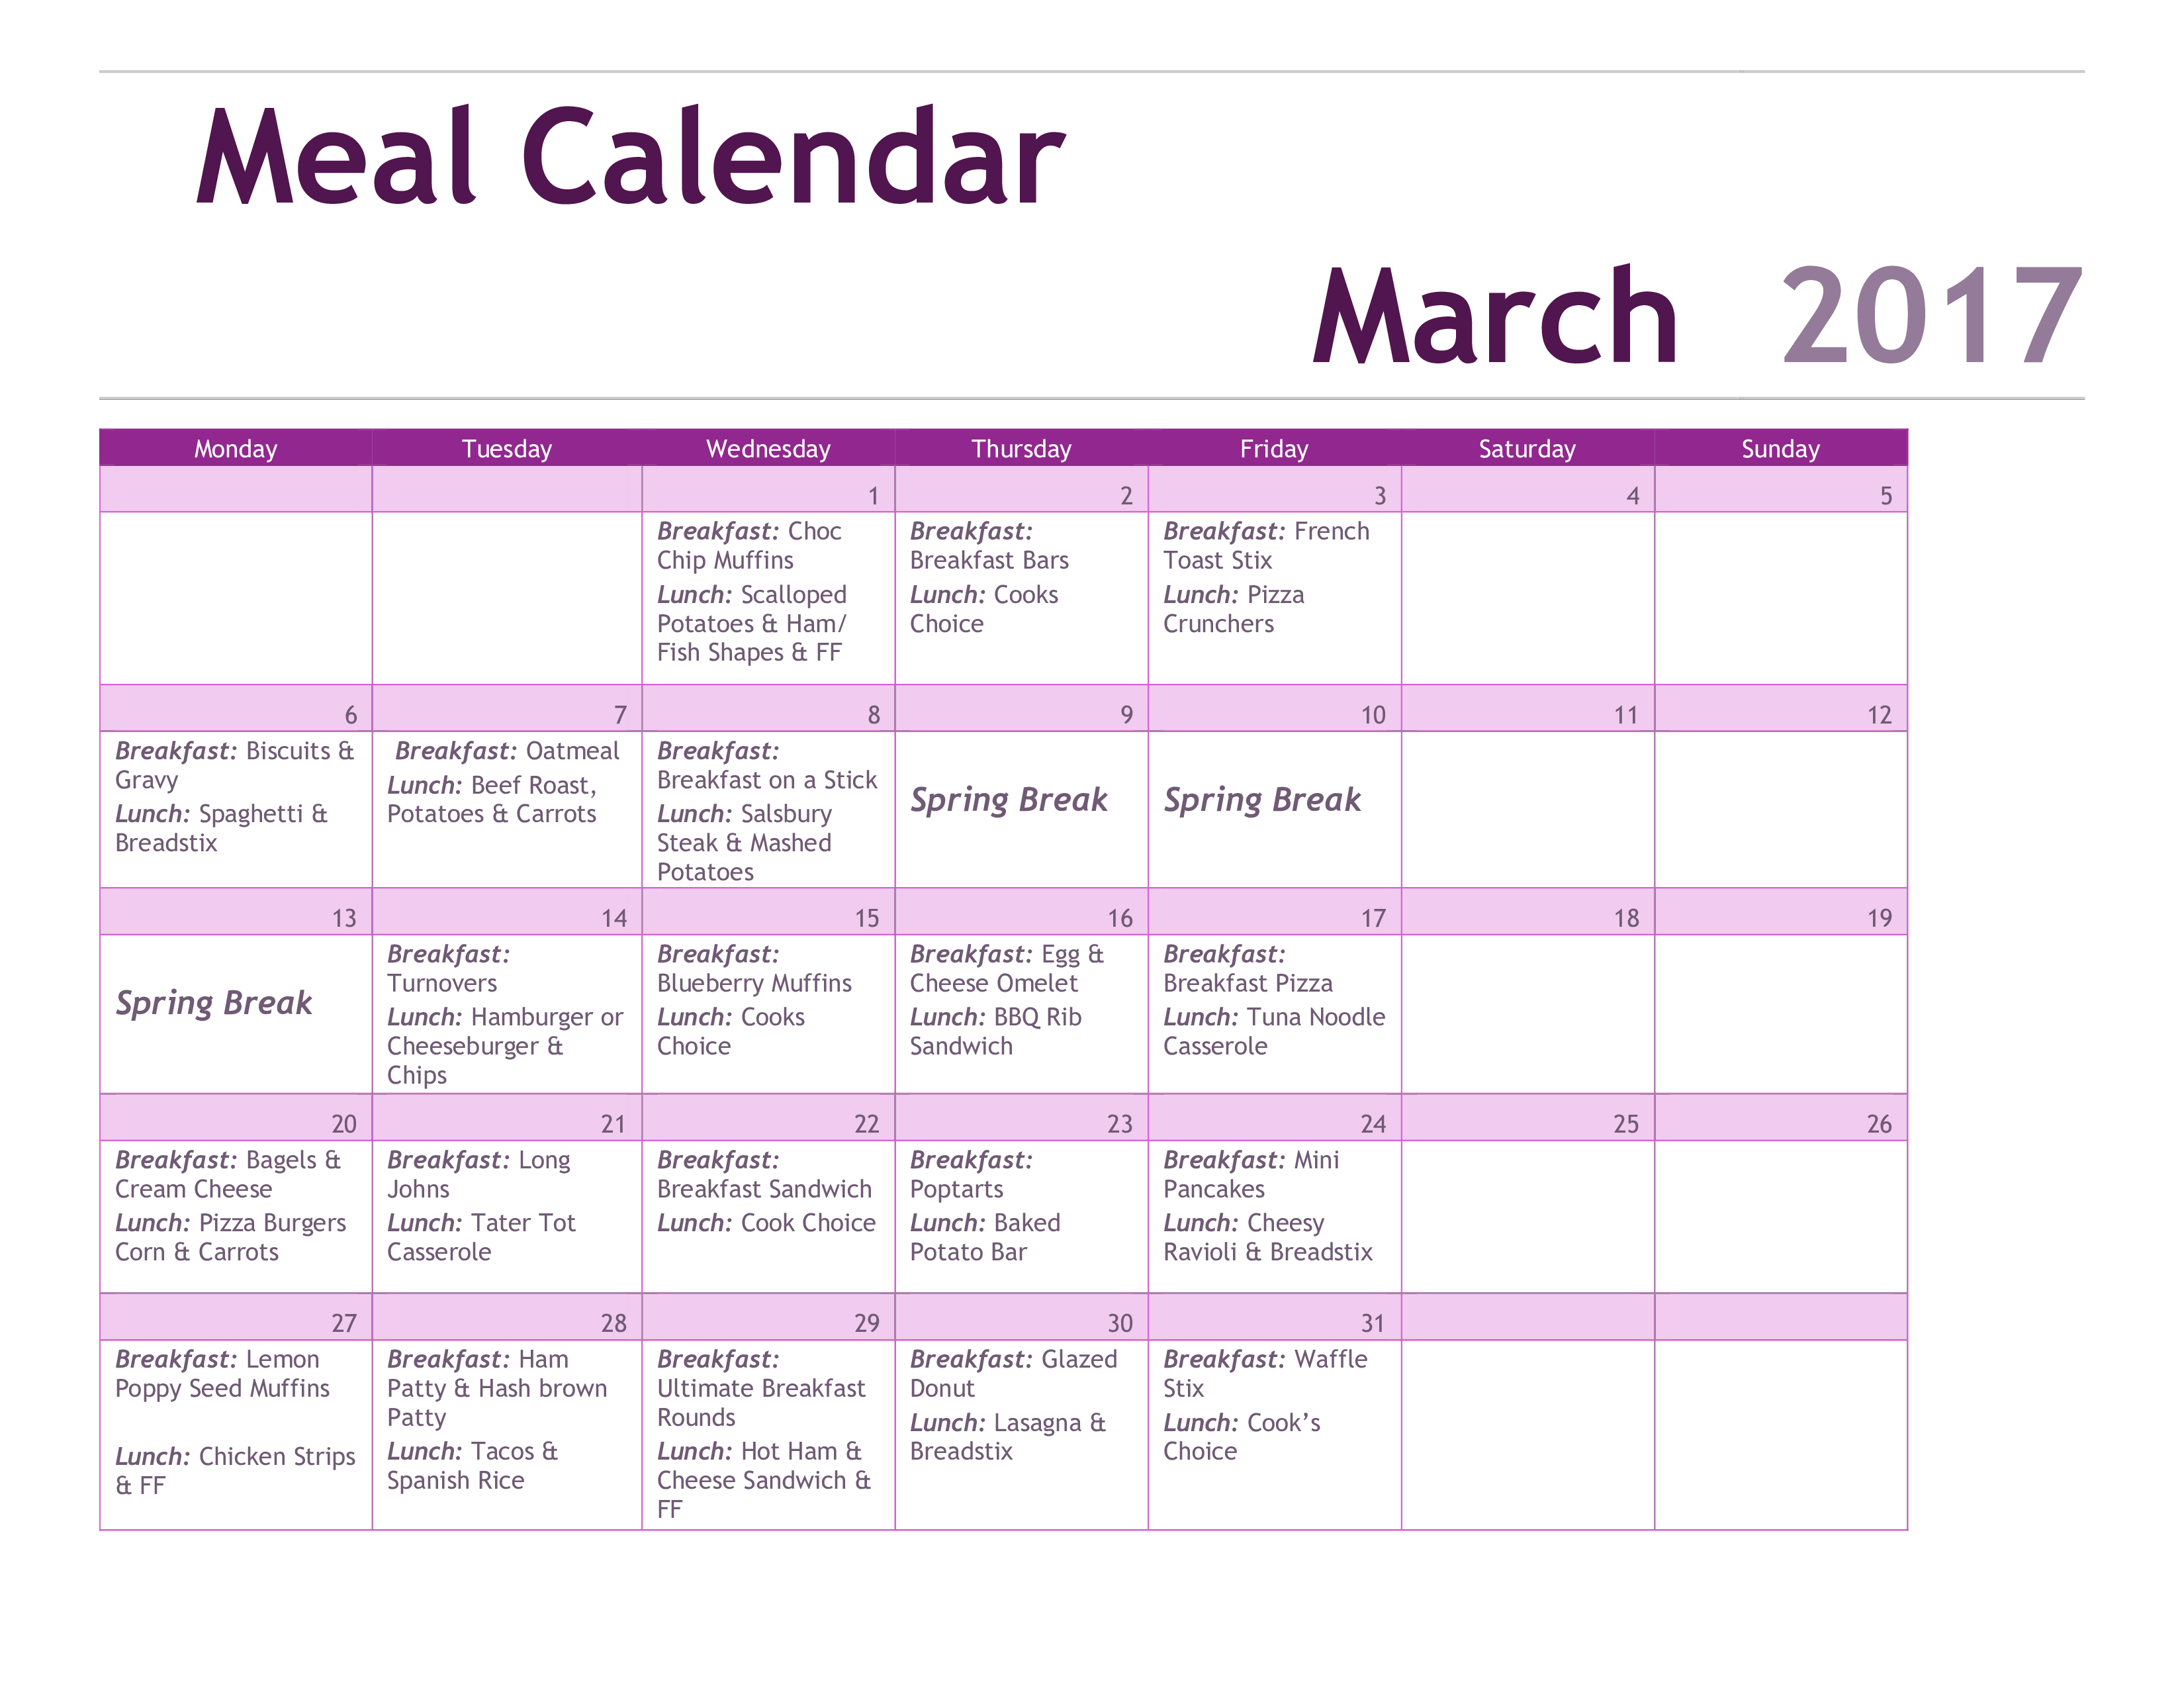 Free Printable Meal Calendar Pdf Templates At Allbusinesstemplates